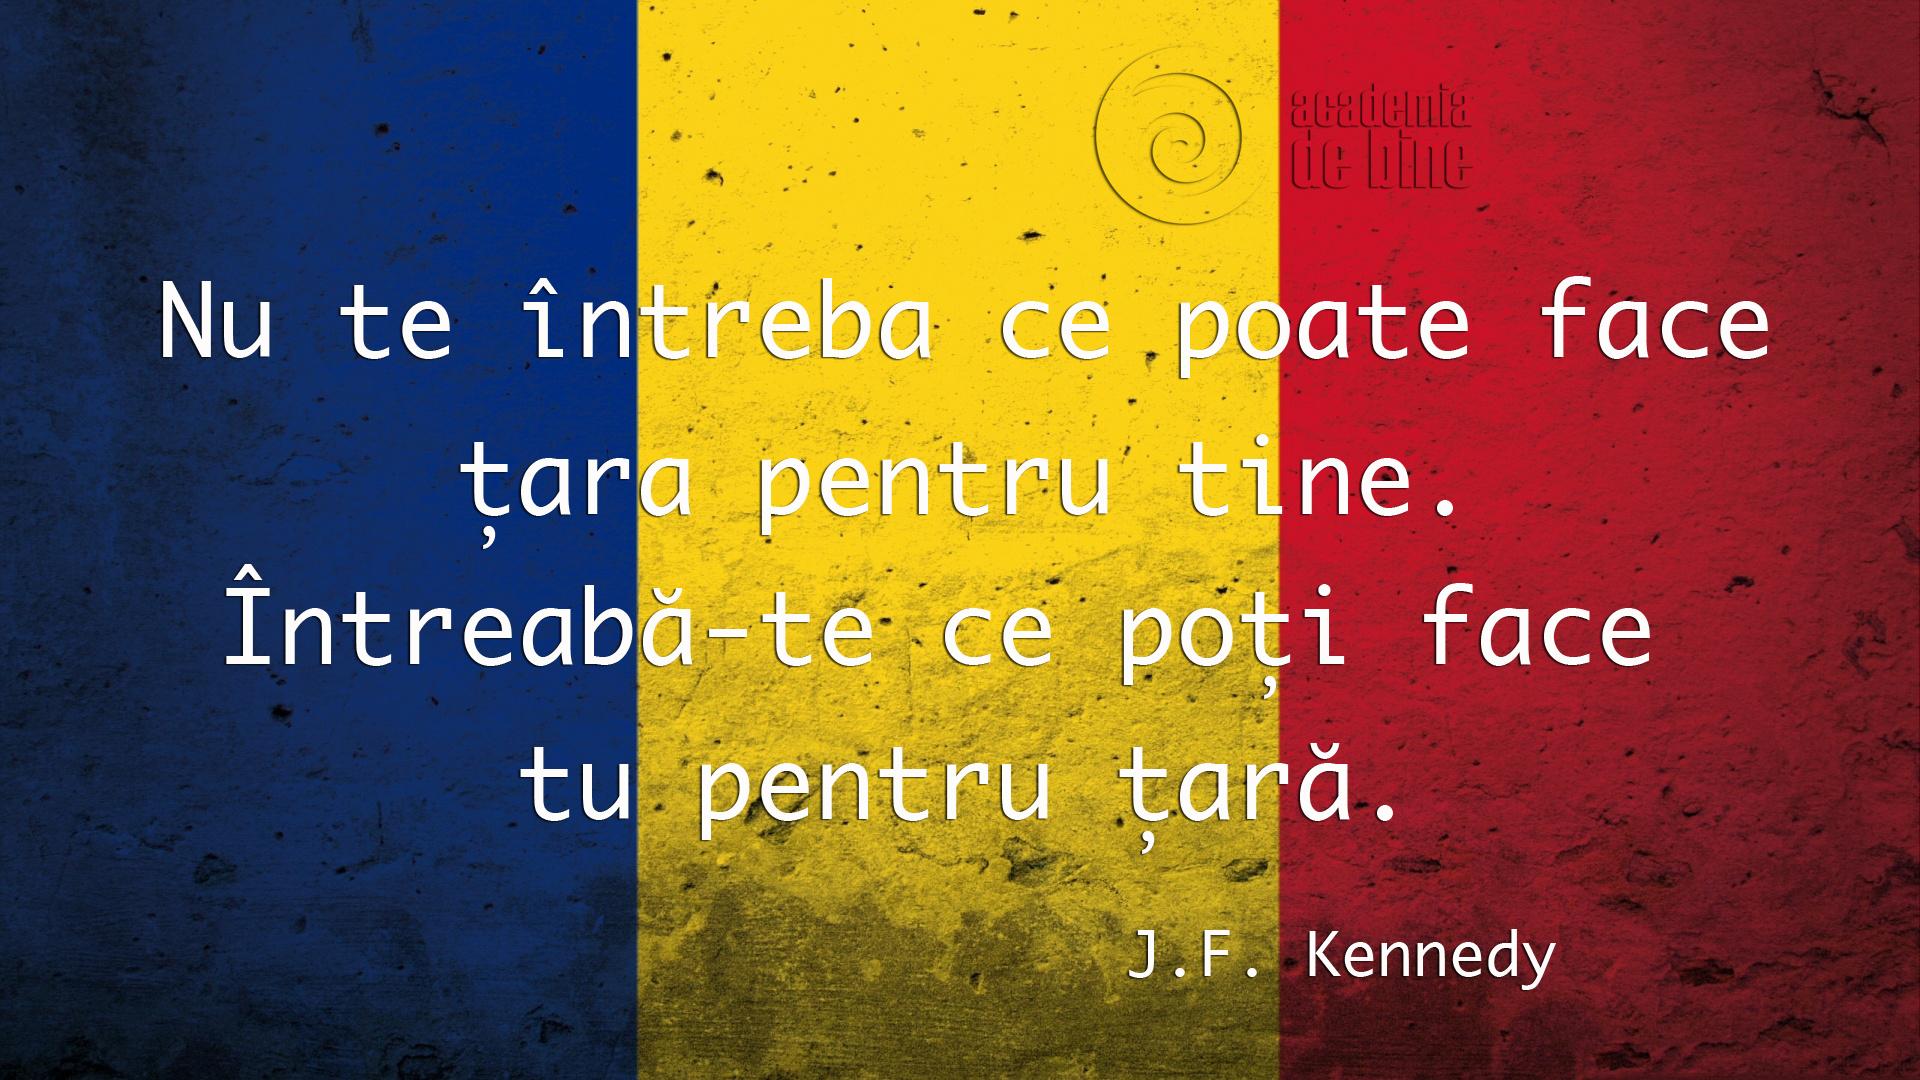 Citate Motivationale Fotografie : Kennedy citate motivationale « drstoica da te n ul